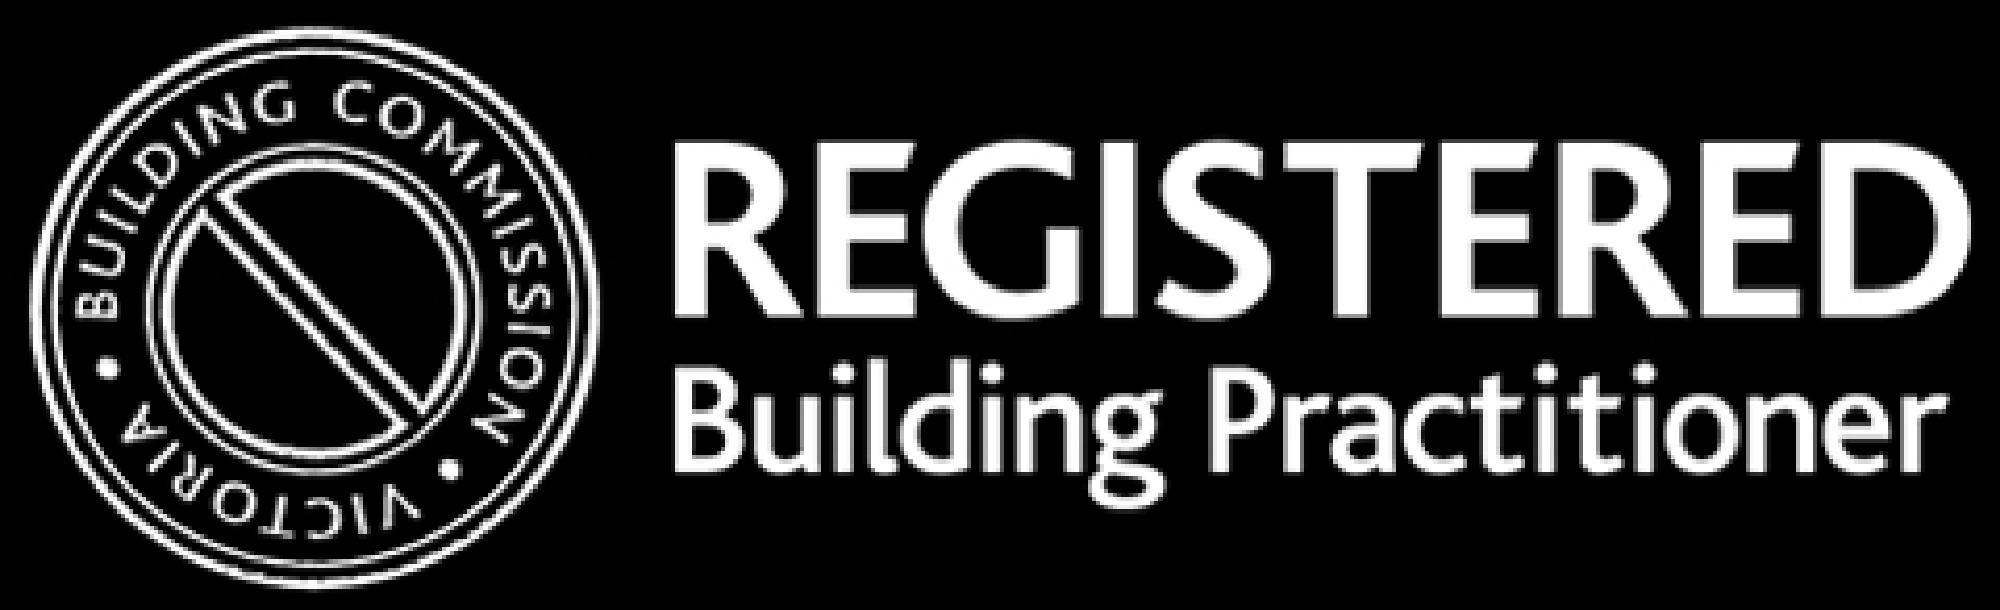 REGISTERED BUILDING PRACTITIONER SANTOSO BUDIMAN GREG ROYCE SWG STUDIO ARCHITECTURE MELBOURNE